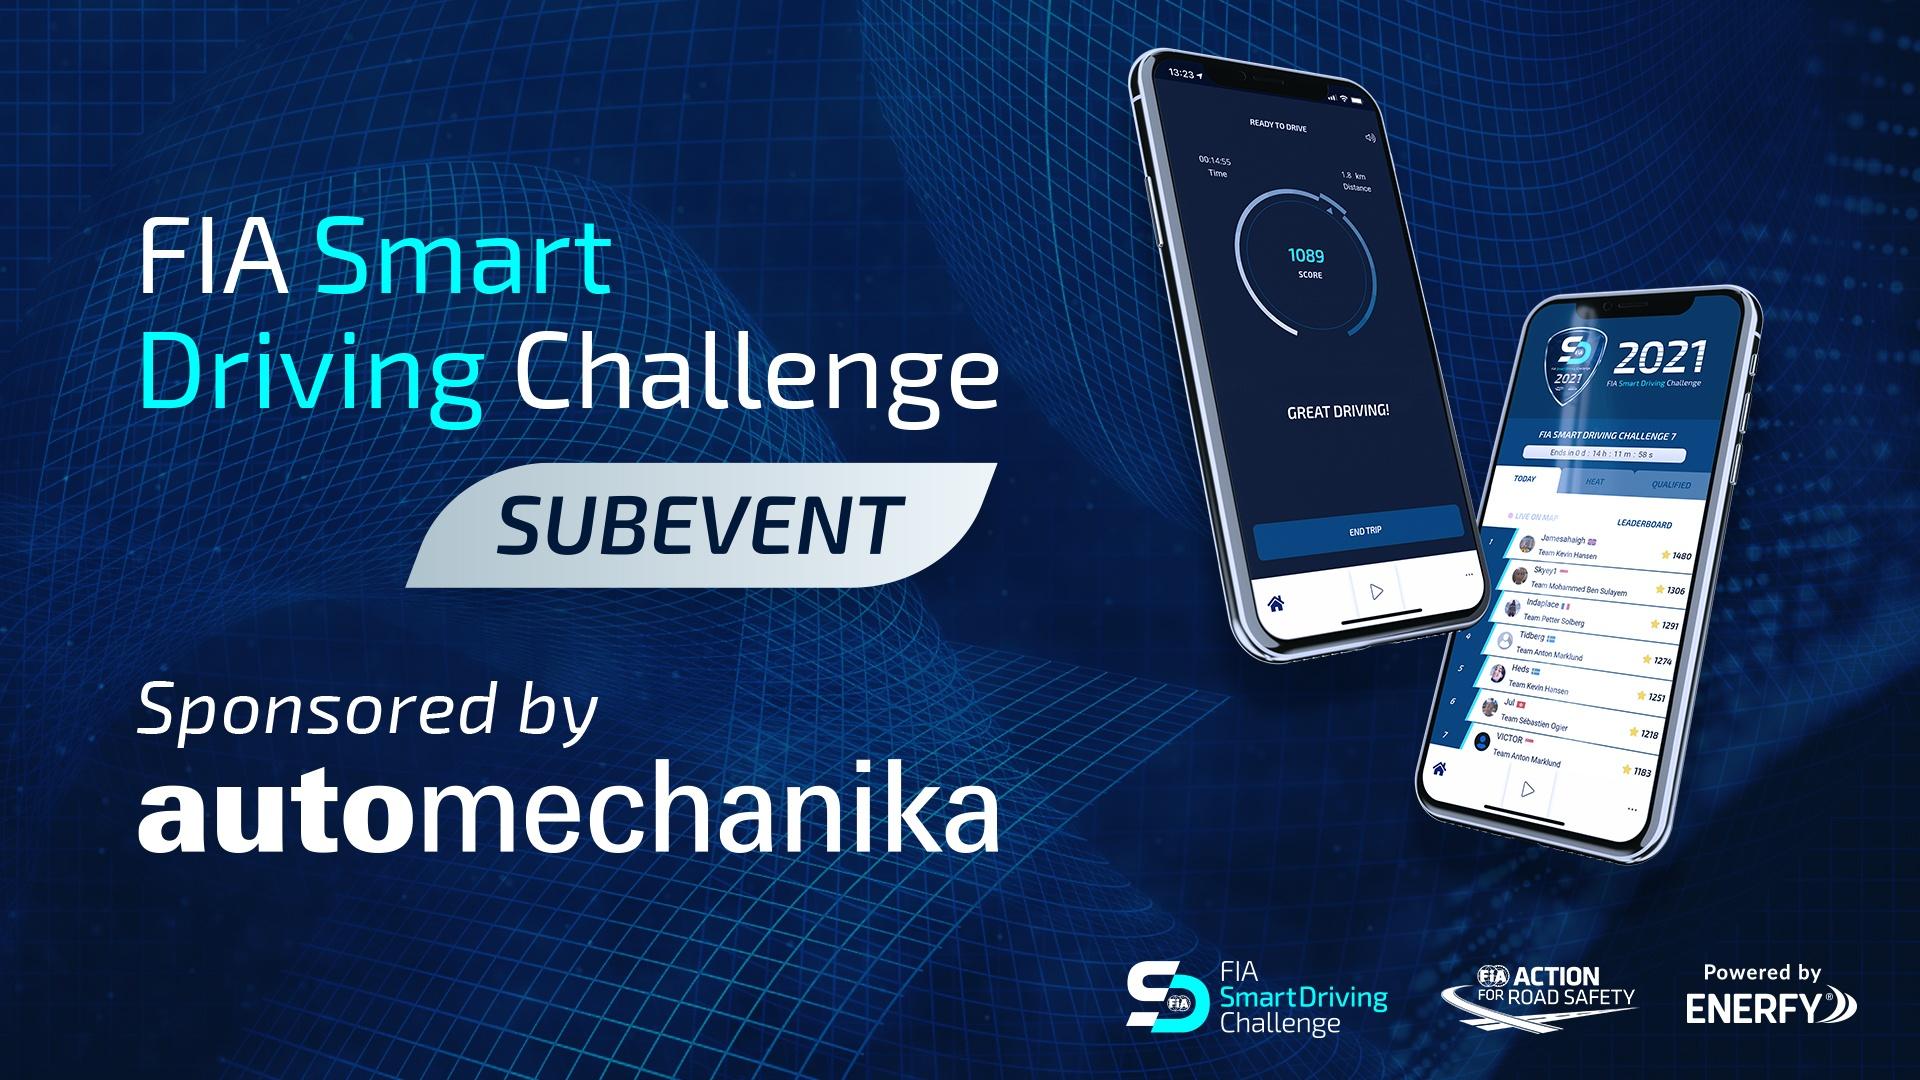 Automechanika launches FIA Smart Driving Challenge Subevent